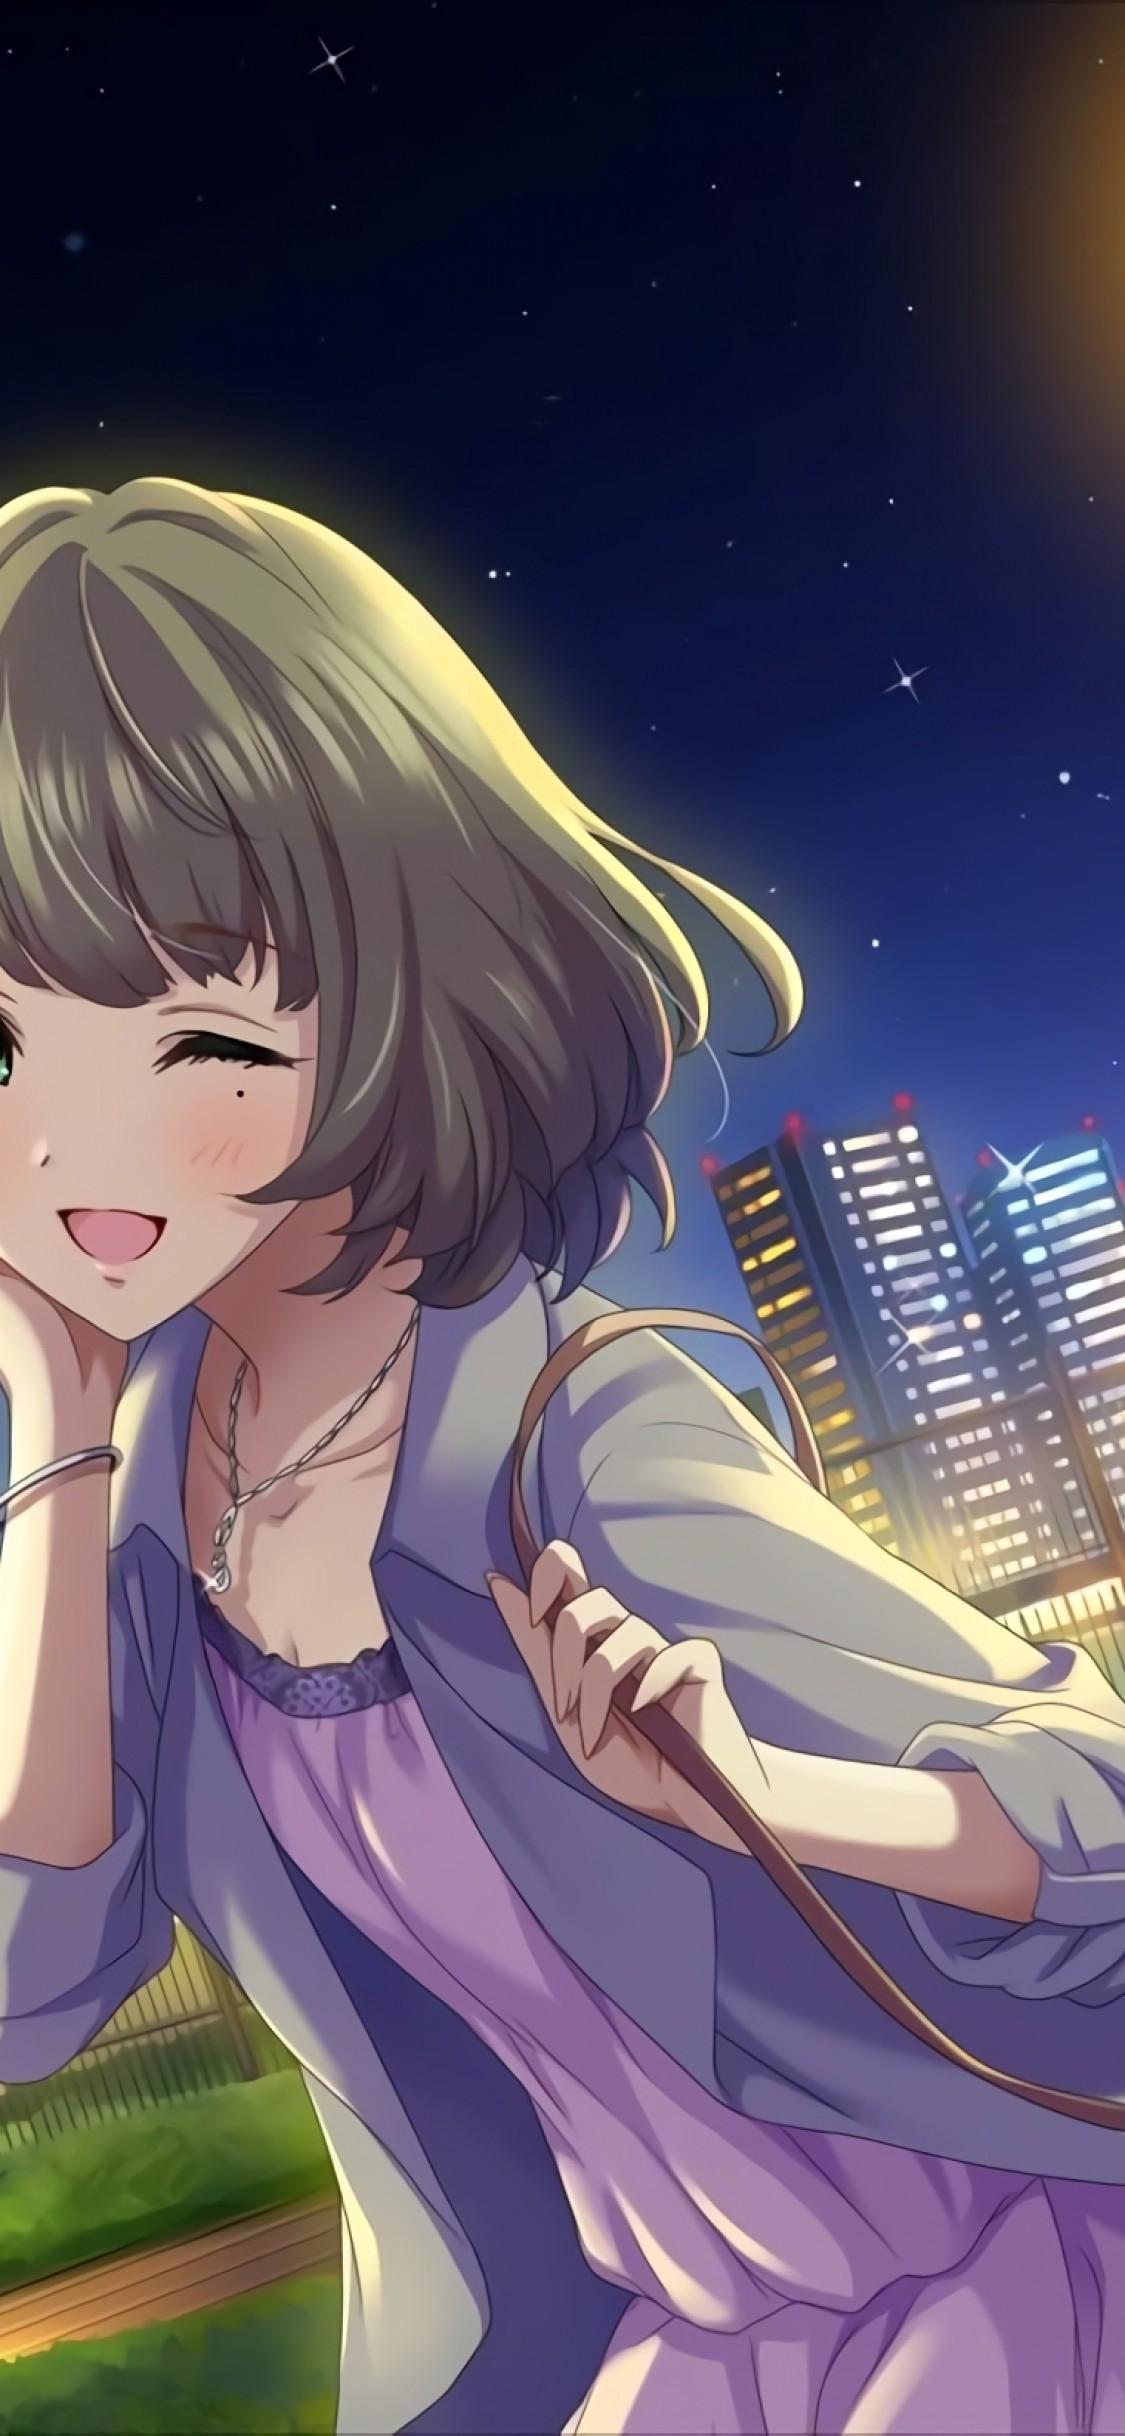 Sad Smile Girl Wallpaper صور انمي خلفيات رائعة لهواتف الآيفون Iphone X Anime عالم